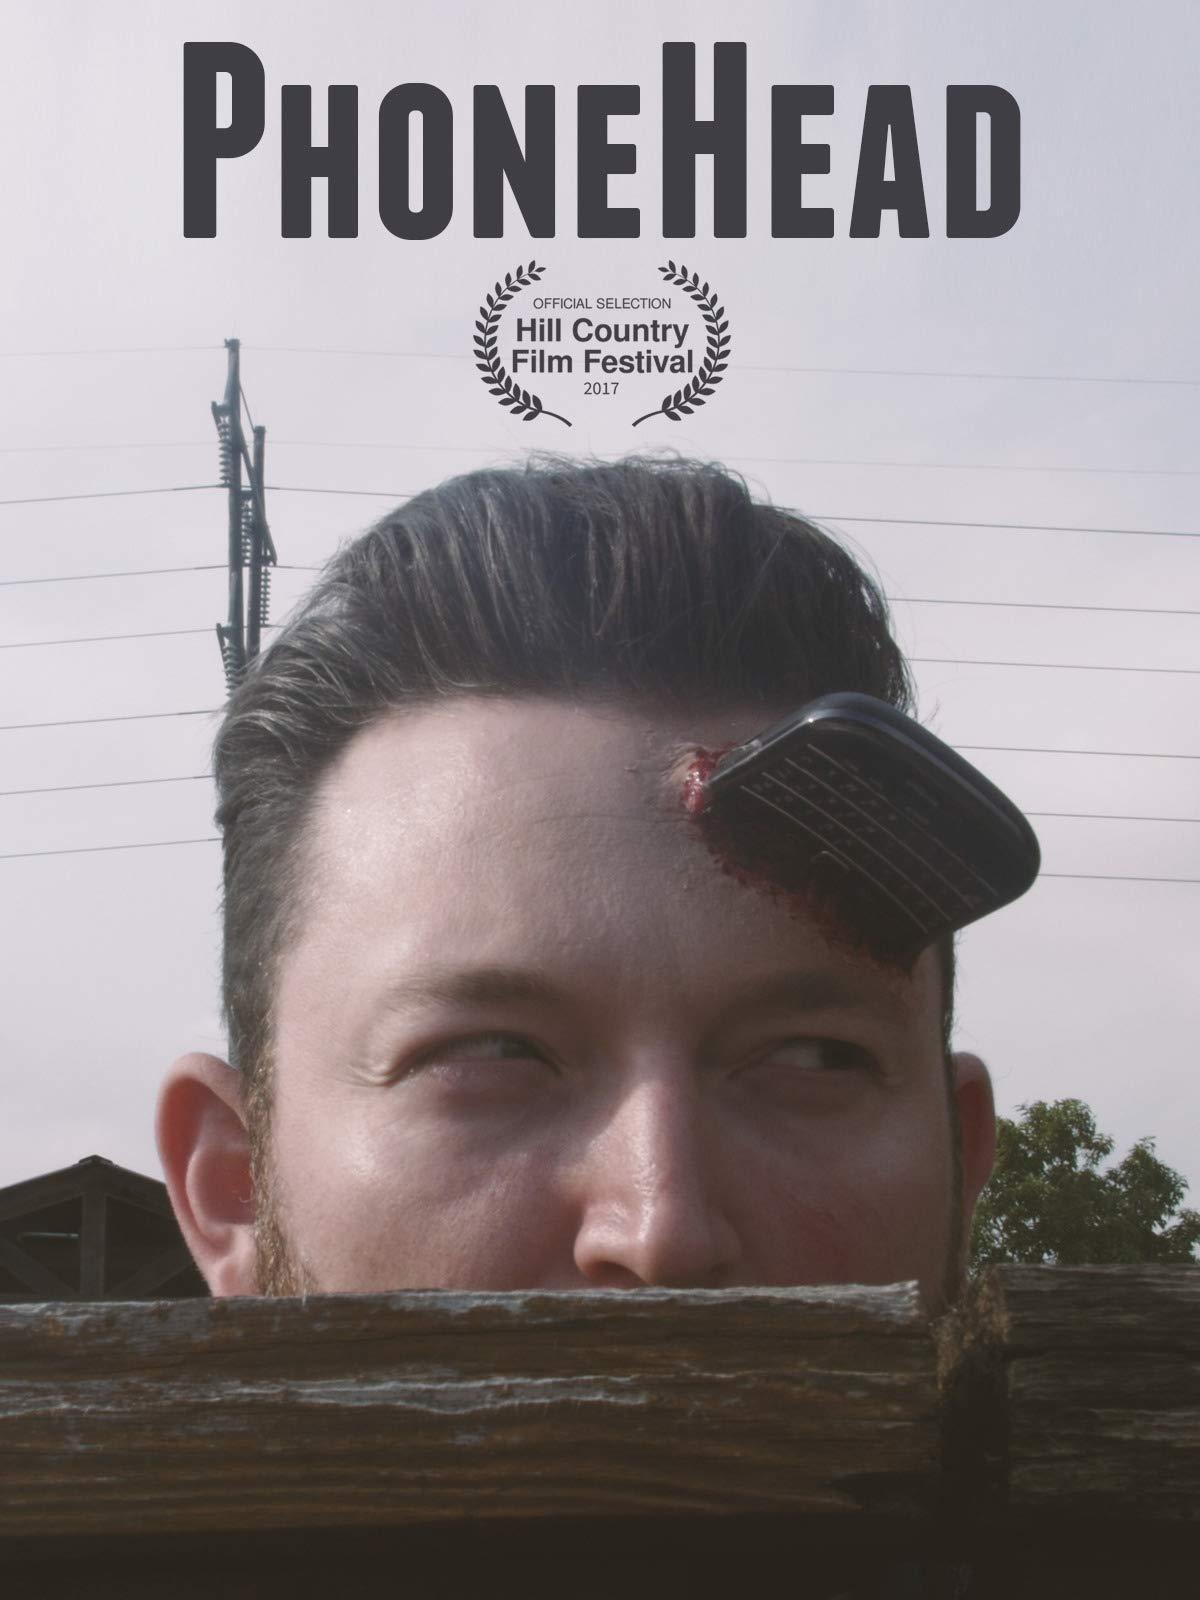 PhoneHead